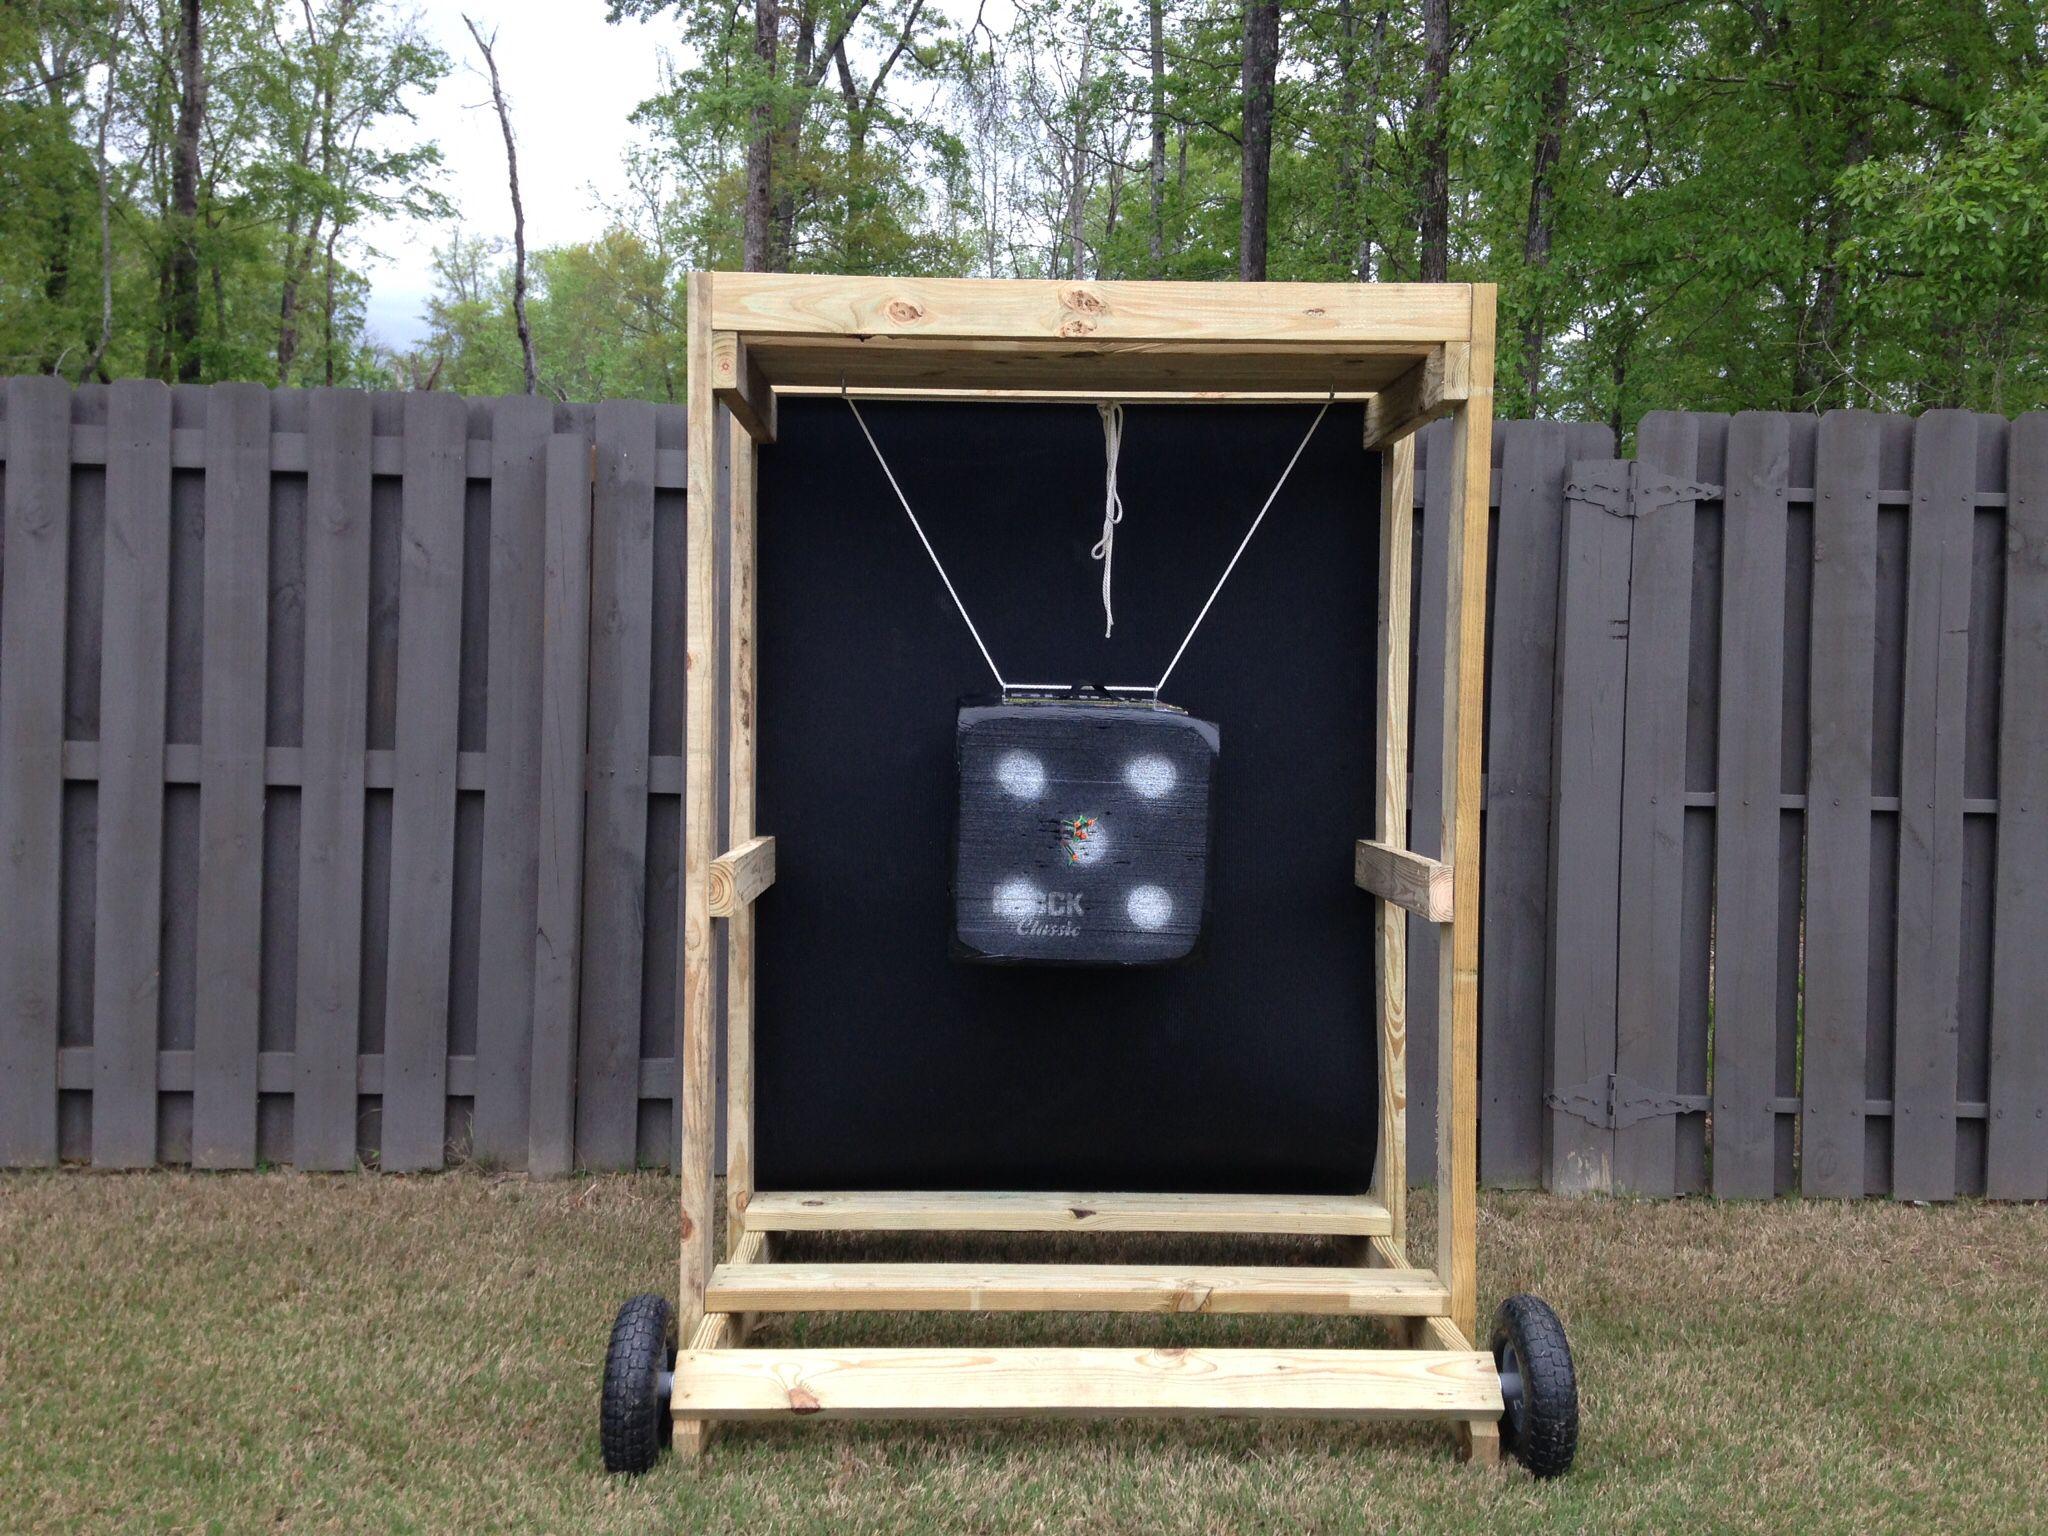 Archery tar backstop … 4 H projects Pinterest